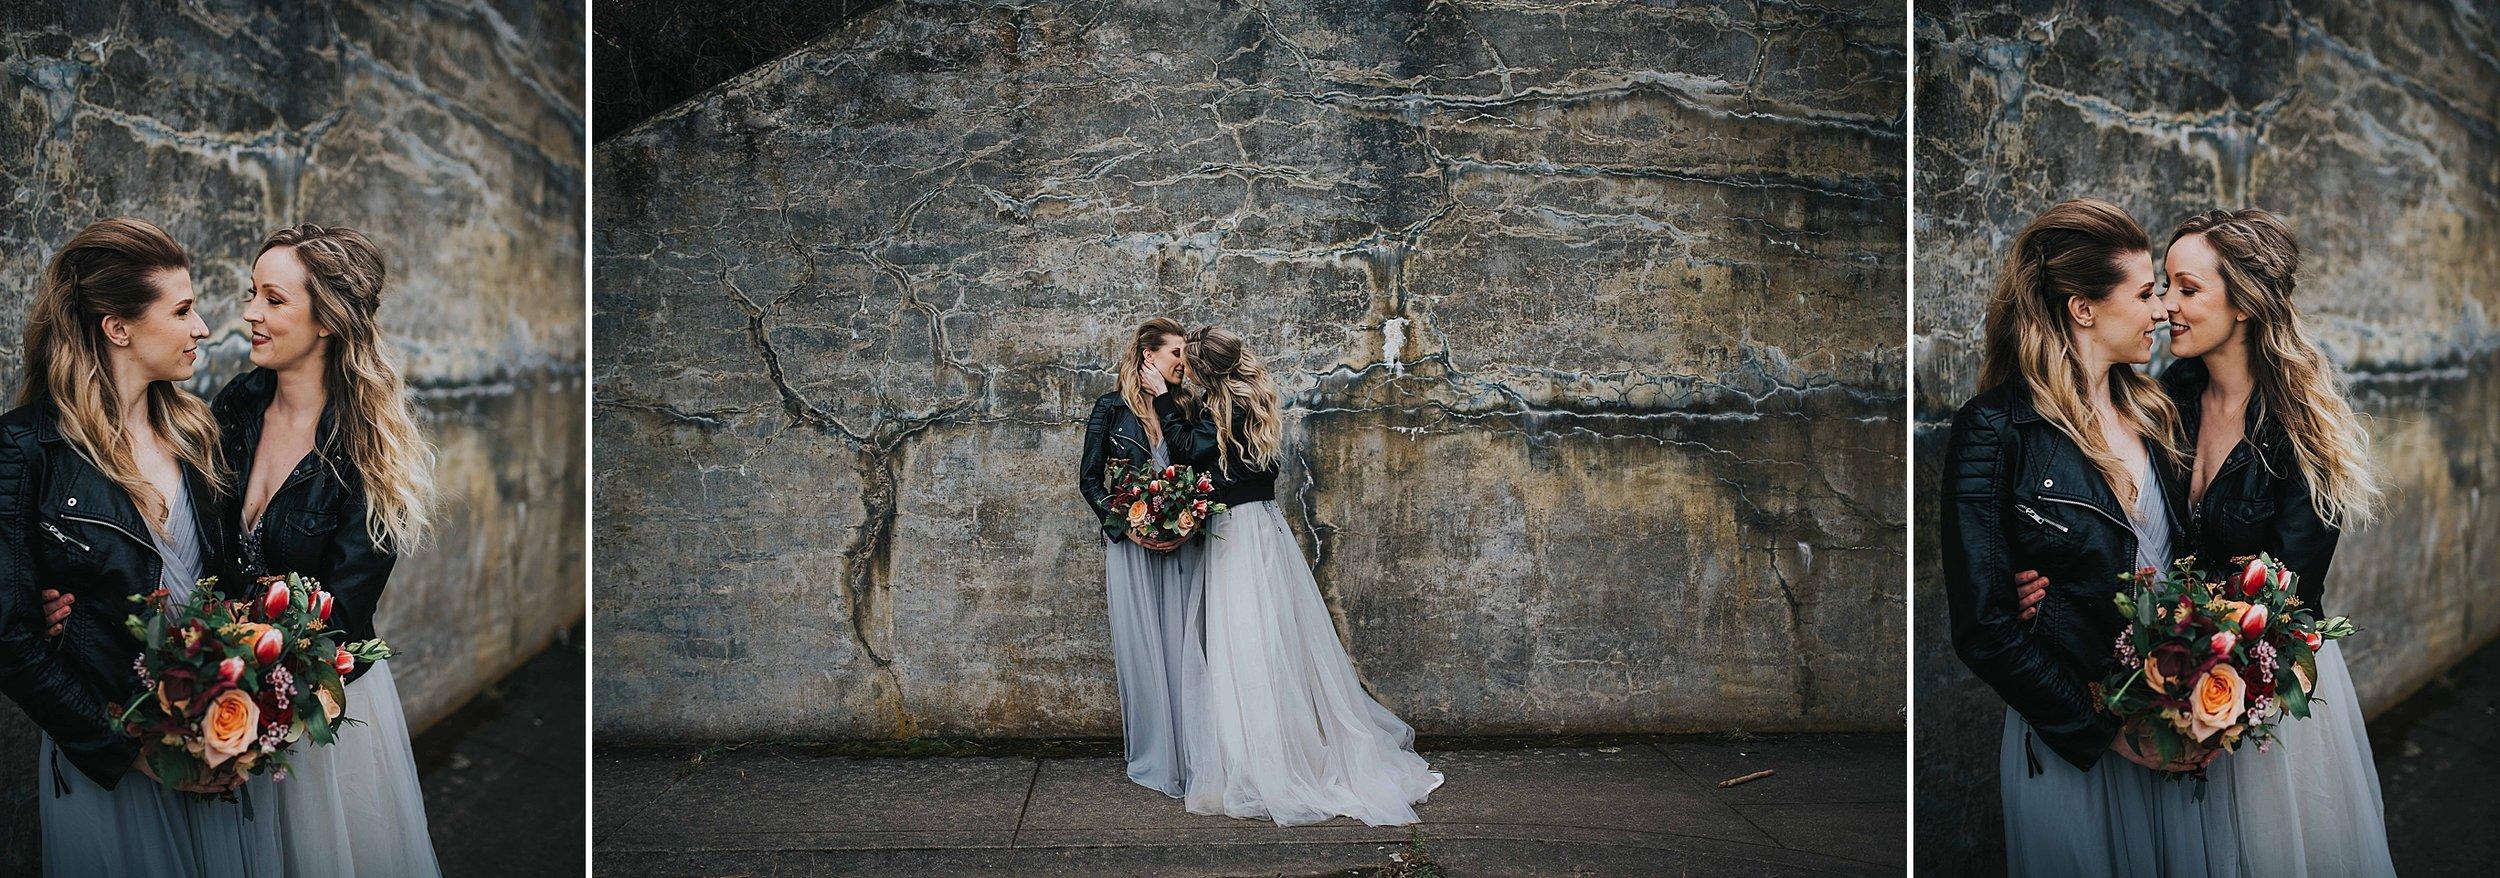 Wedding-photographer-J HODGES PHOTOGRAPHY_0240.jpg